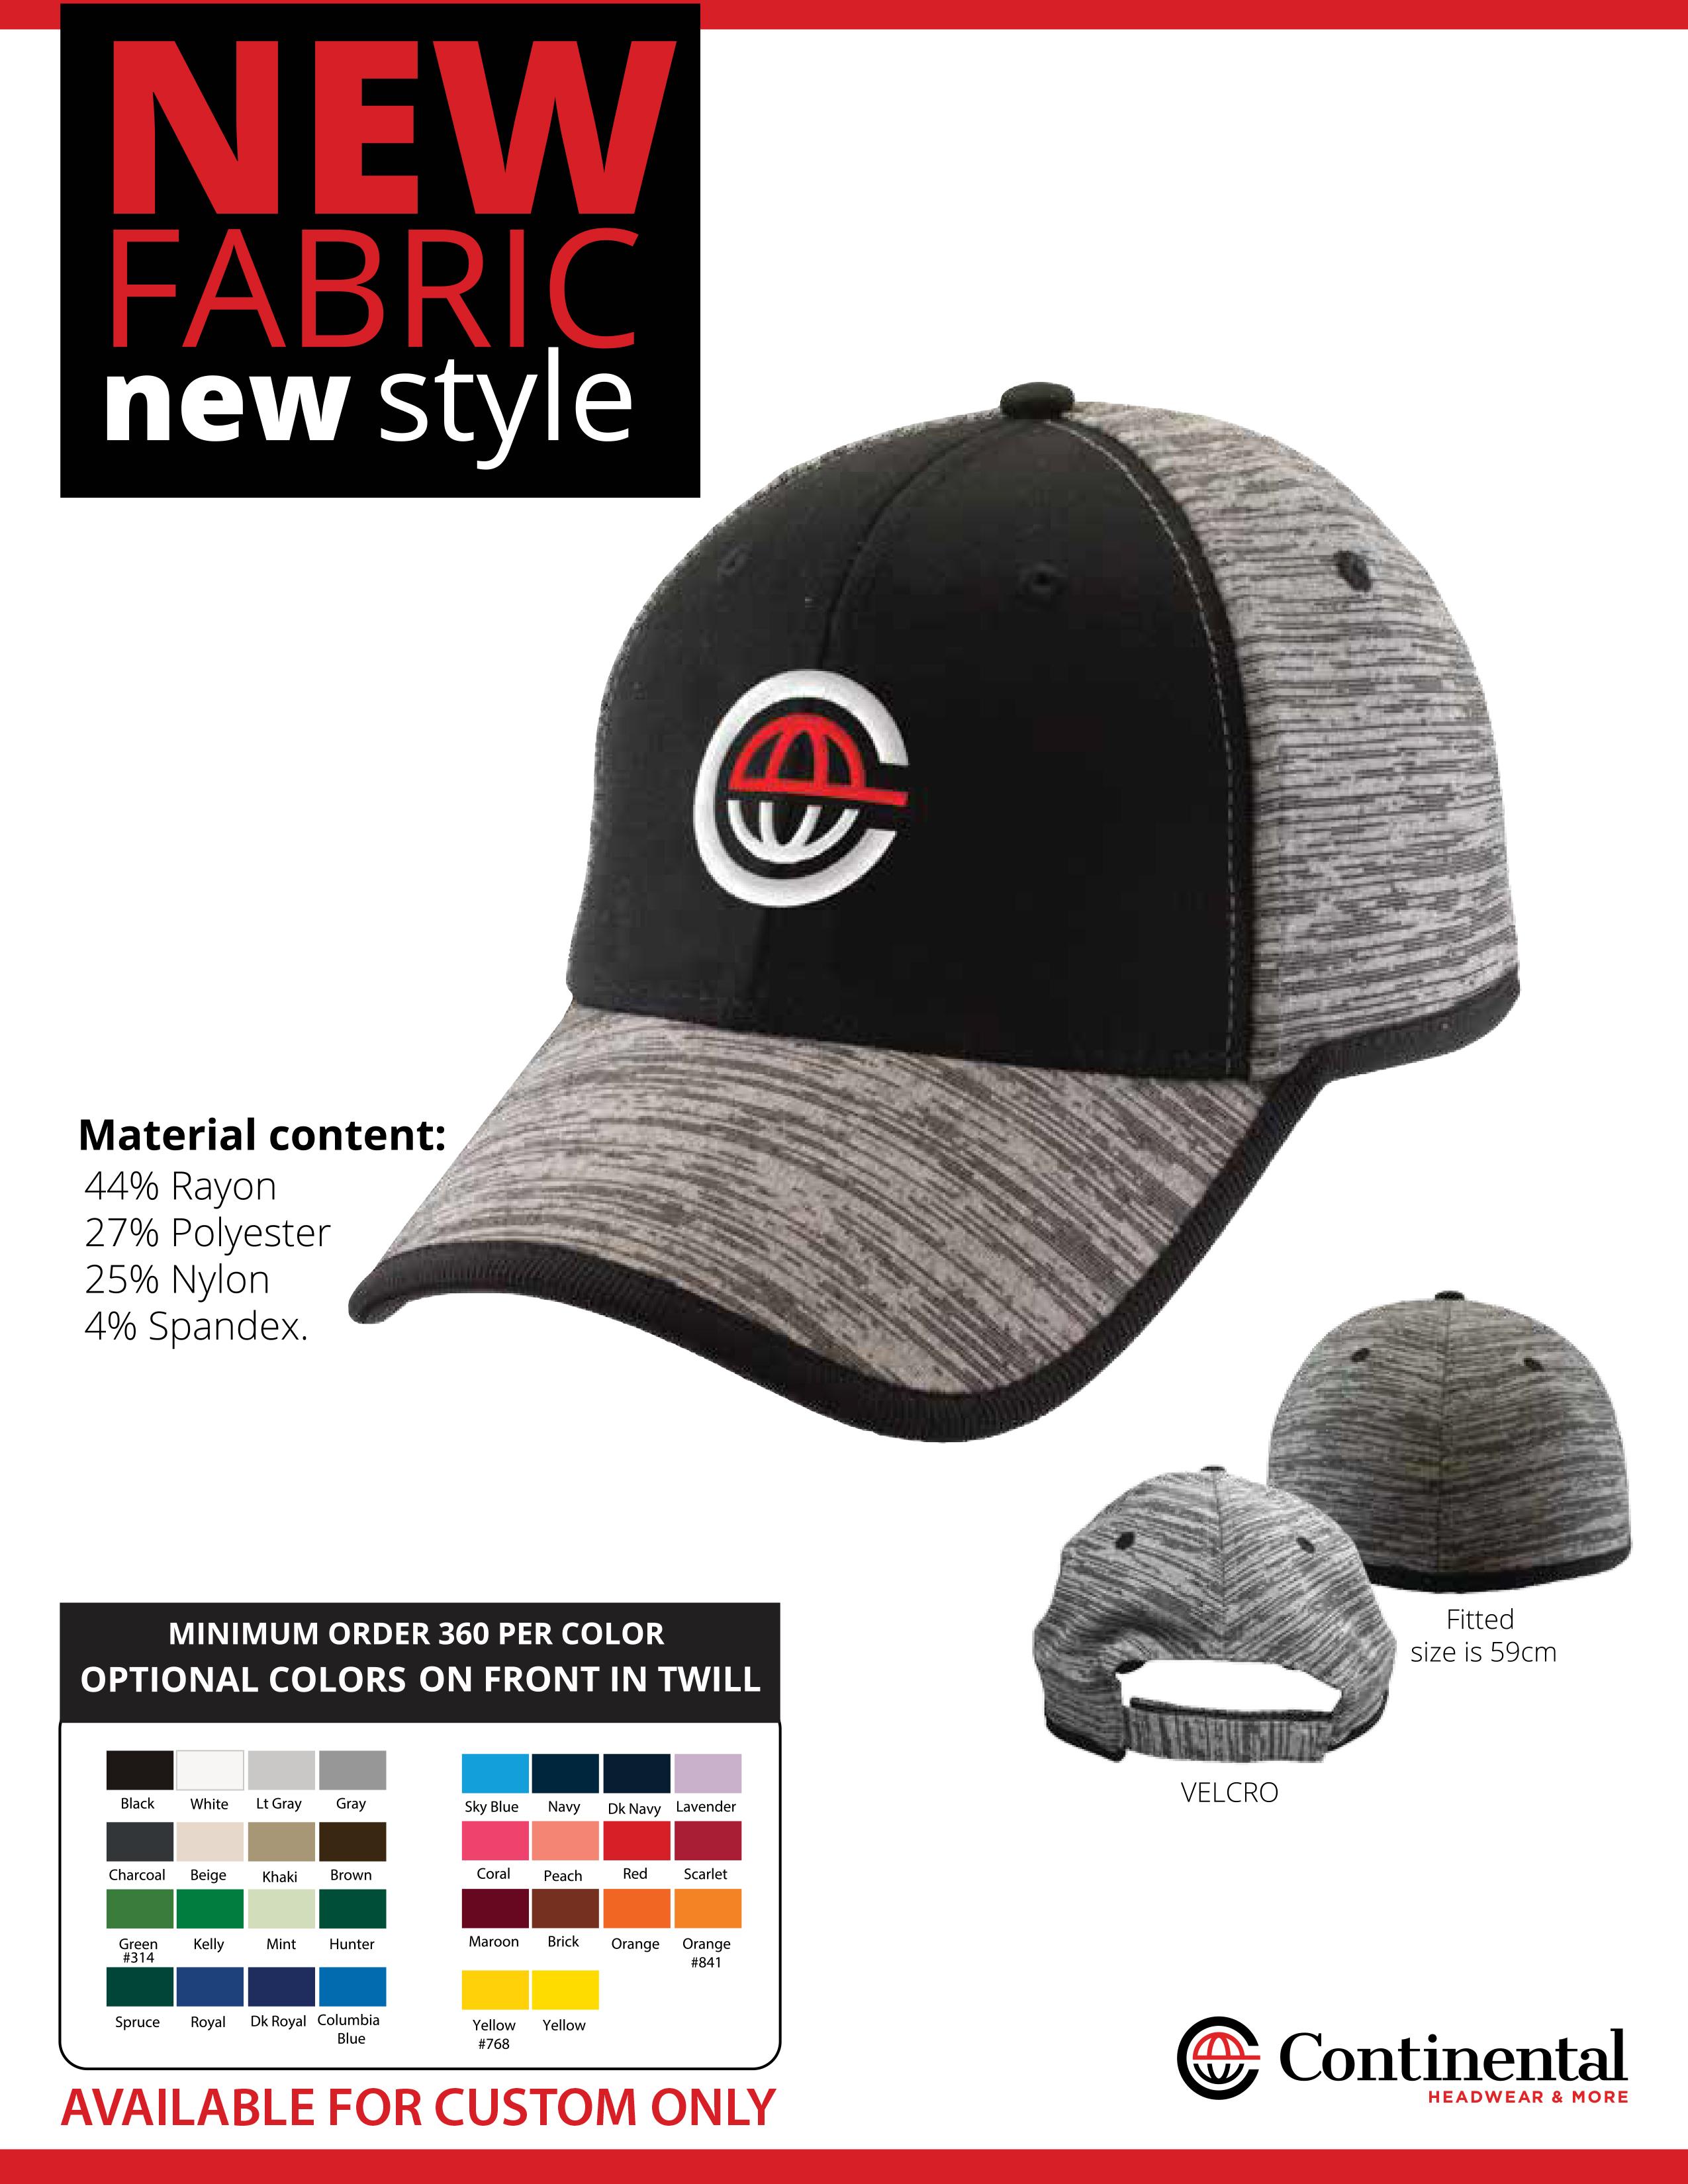 continental headwear design your